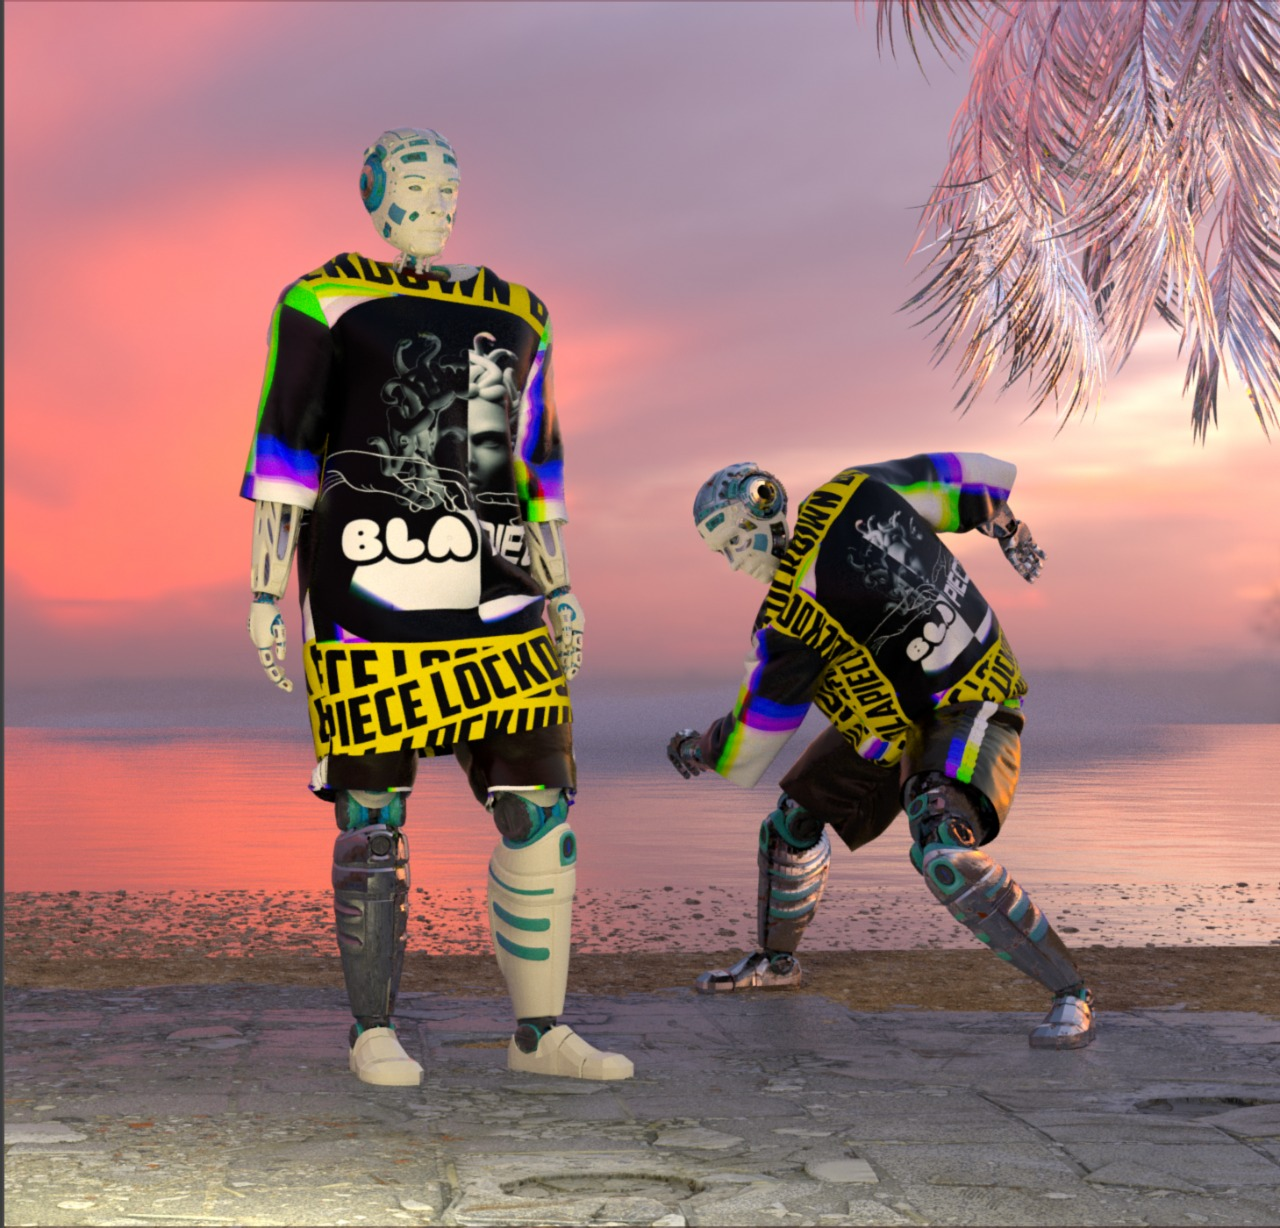 New Fashion Line, Blapiece, Stuns With Robot Models And Technology-Savvy Brand